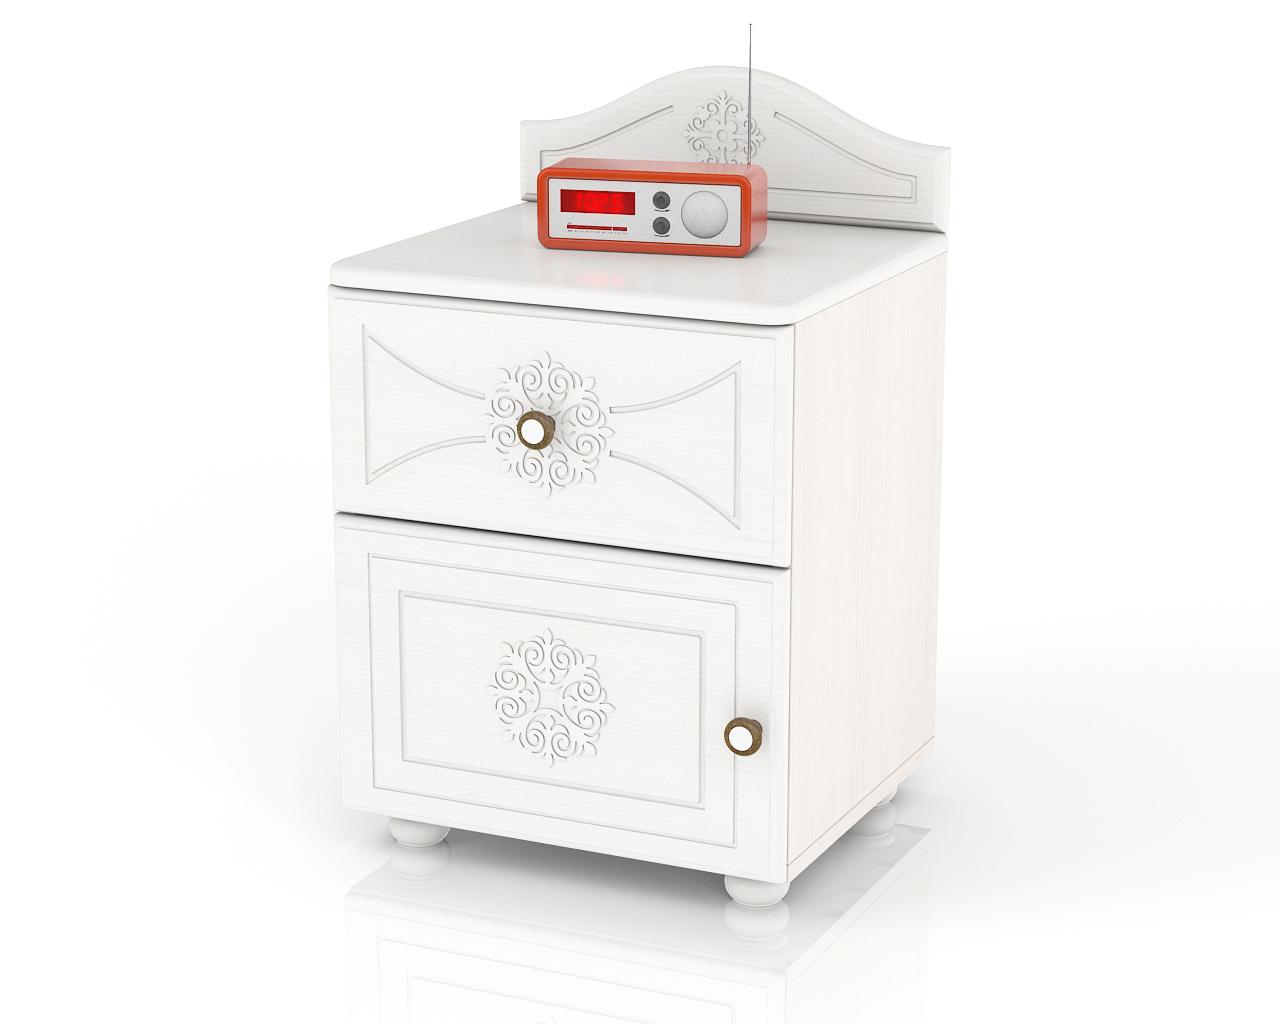 Продажа мебели в интернет-магазине ВашаКомната.РФ – фото 1.20